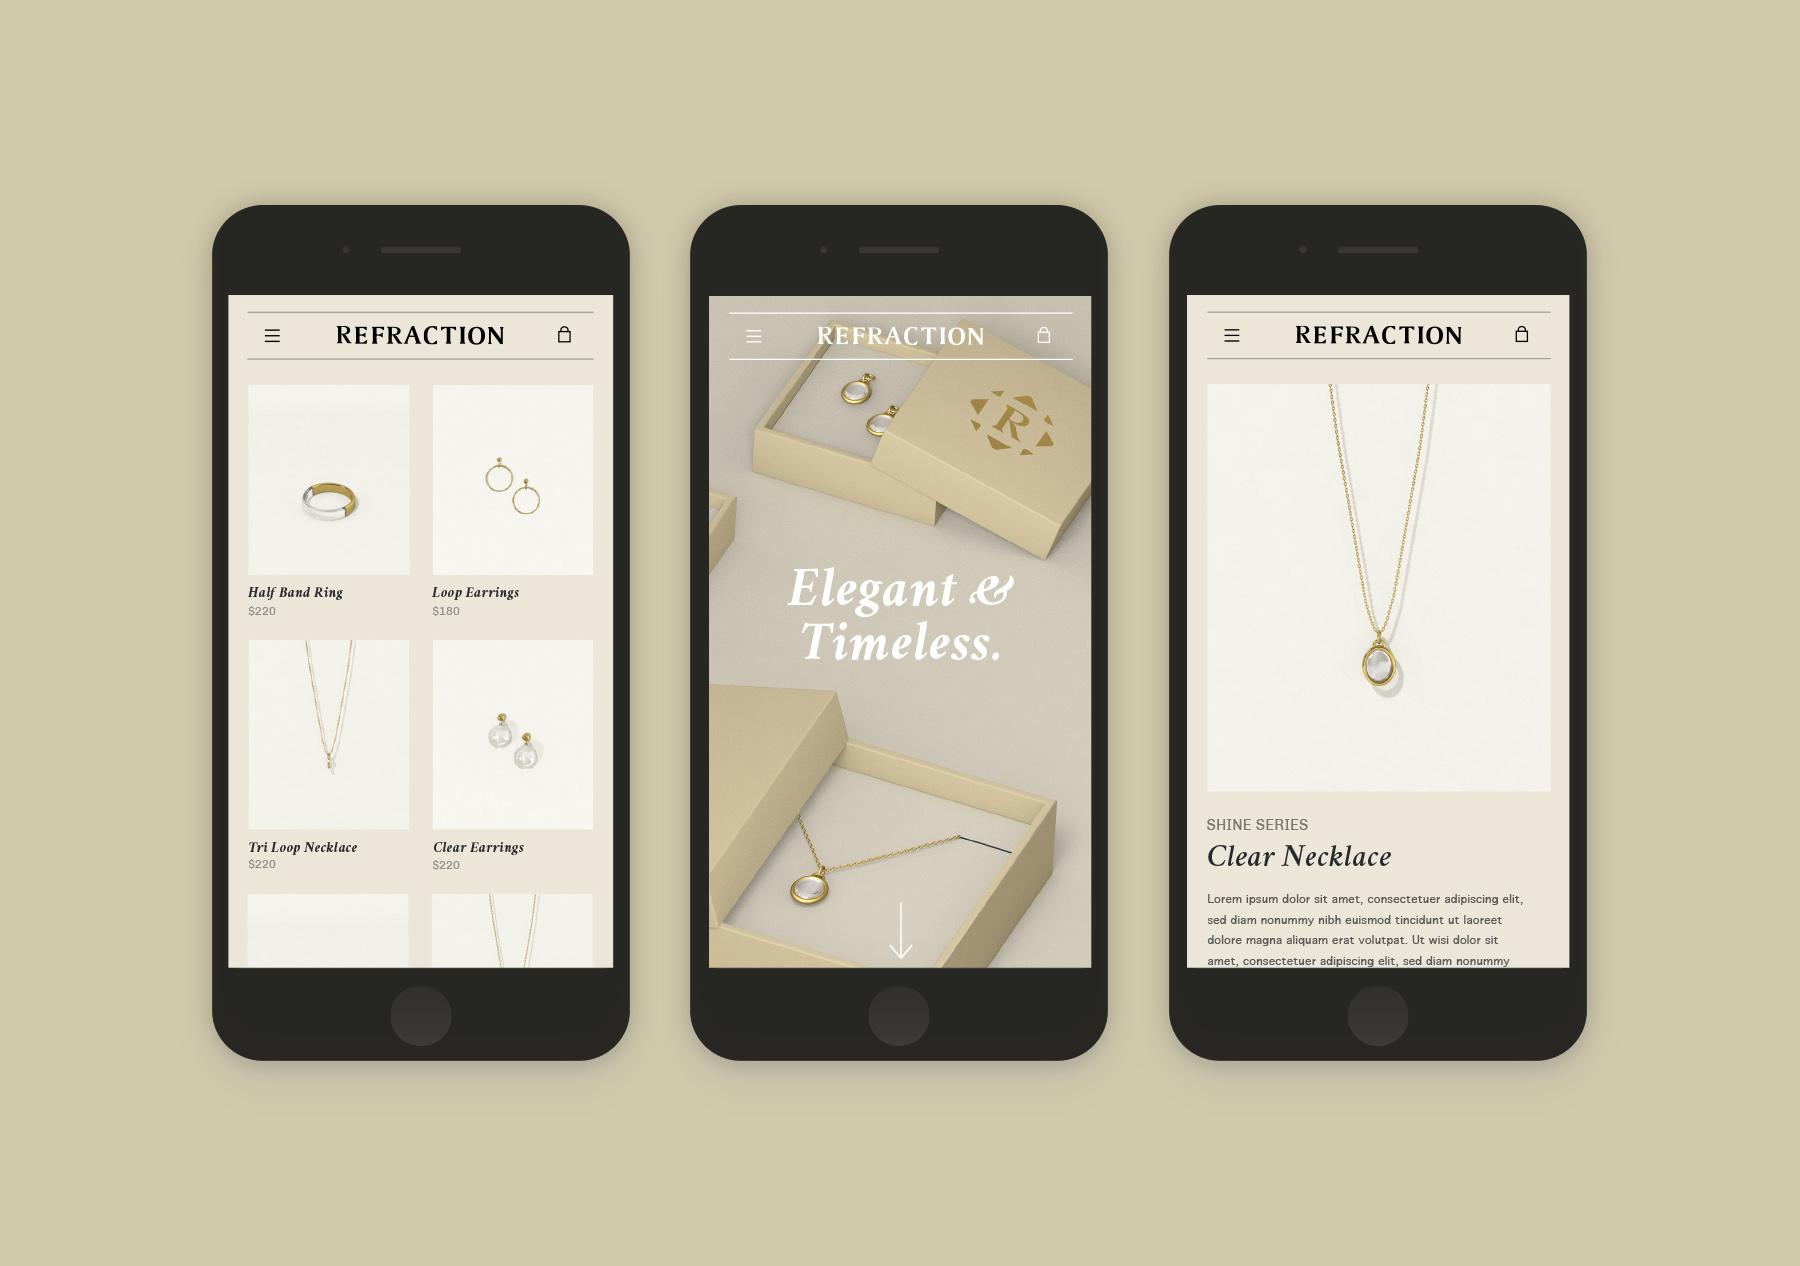 Refraction Website Concept Mobile Screens